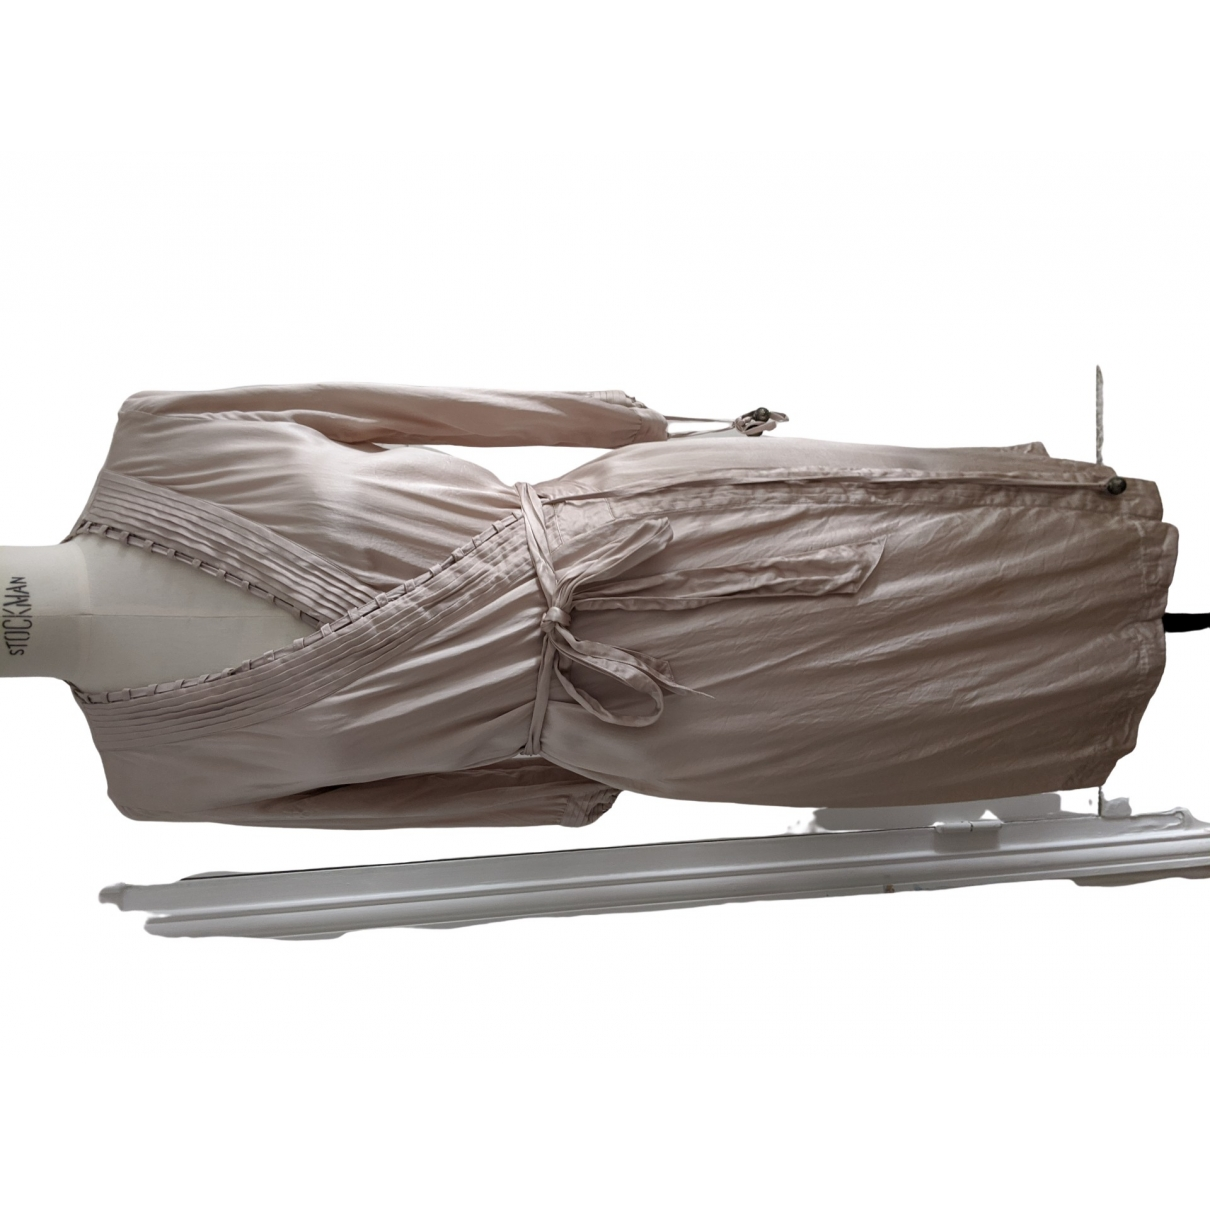 Stella Mccartney For H&m \N Silver Silk dress for Women 36 FR